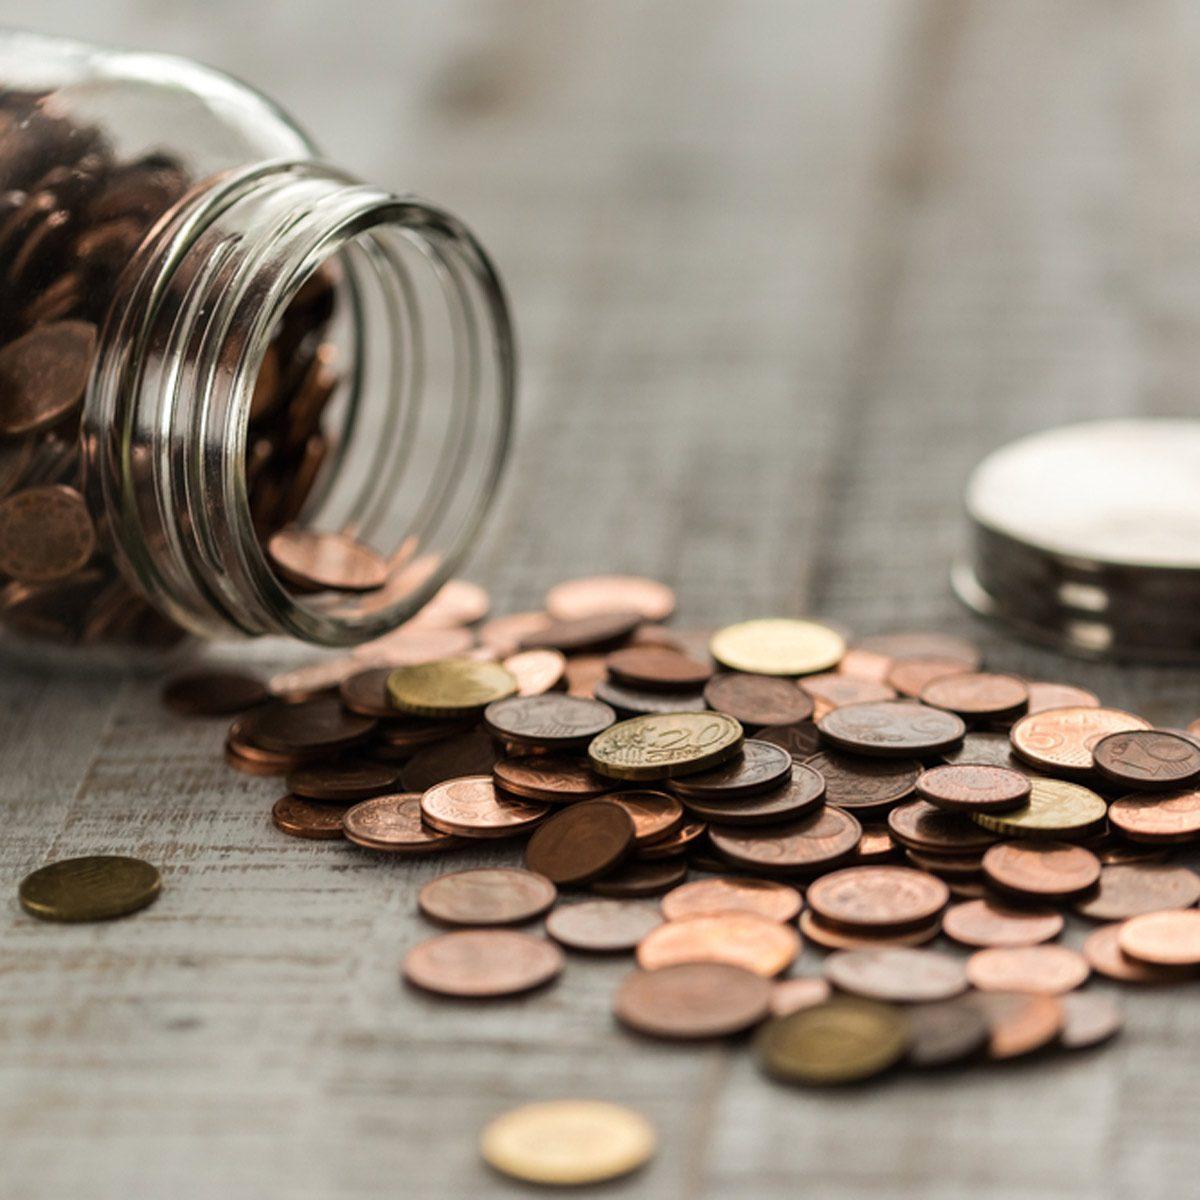 Jar of Change penny pincher